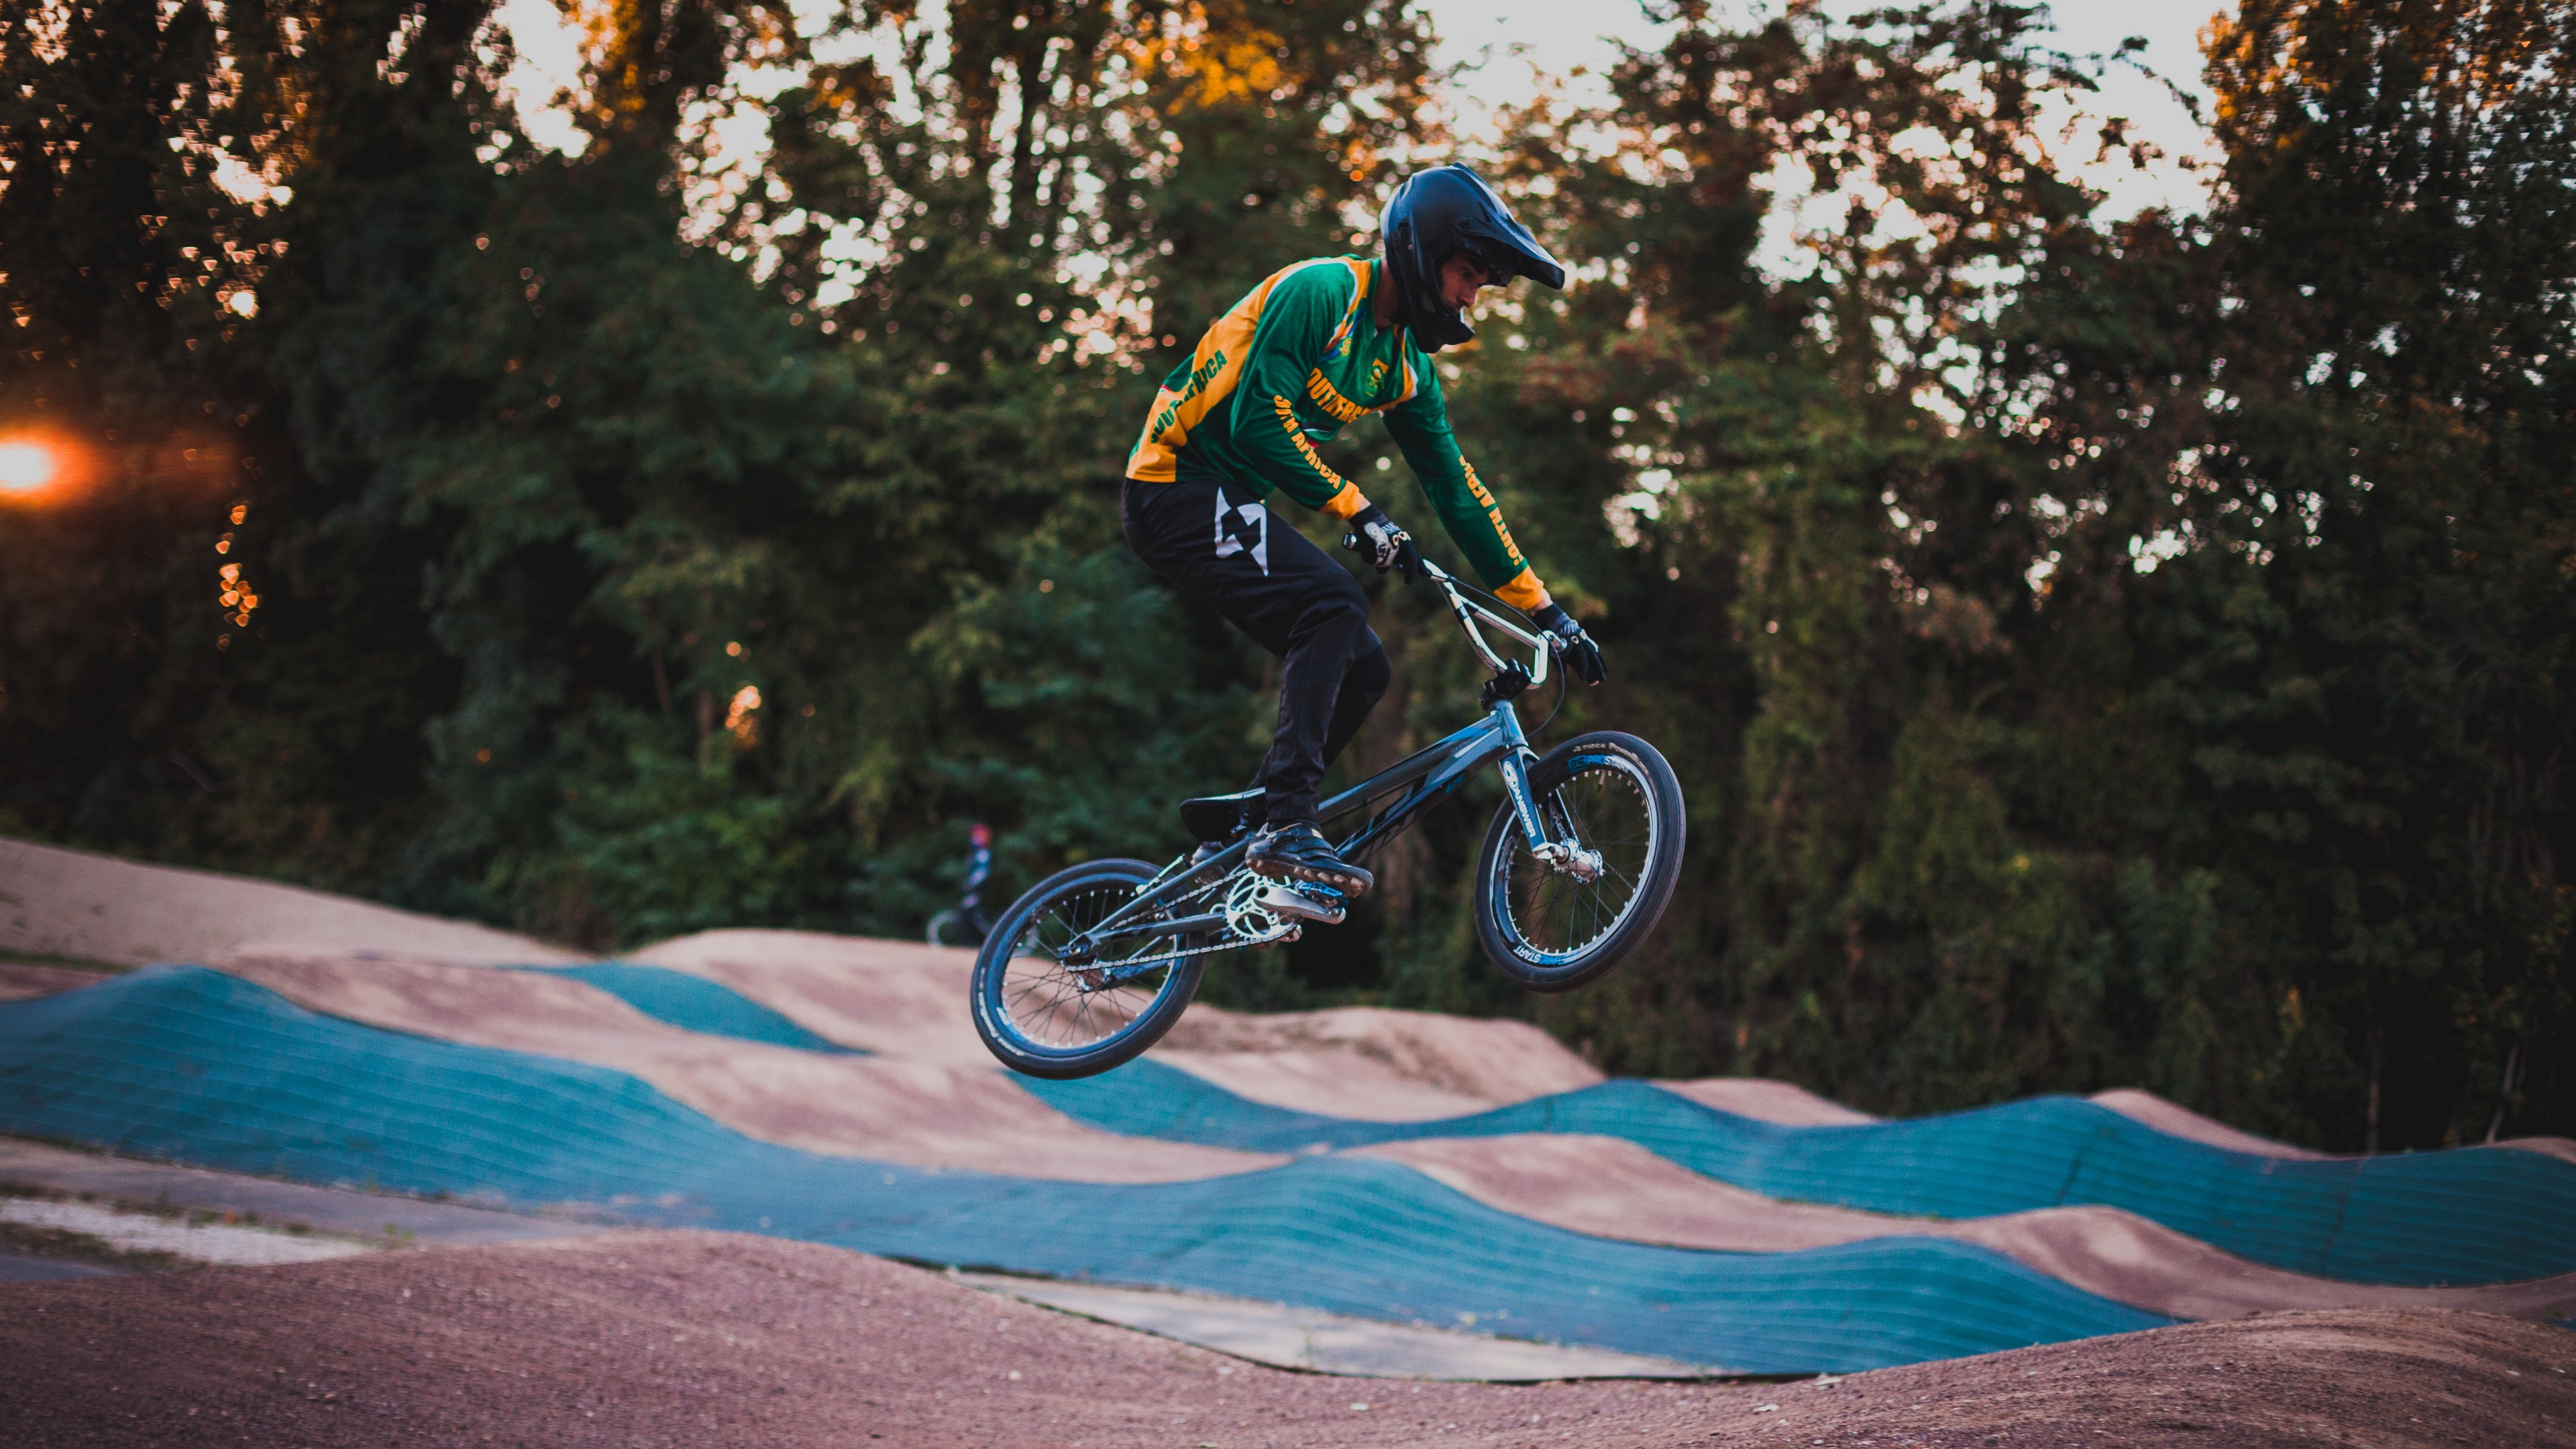 cyclist stunt jump helmet cycle track 4k 1540060828 - cyclist, stunt, jump, helmet, cycle track 4k - Stunt, jump, cyclist